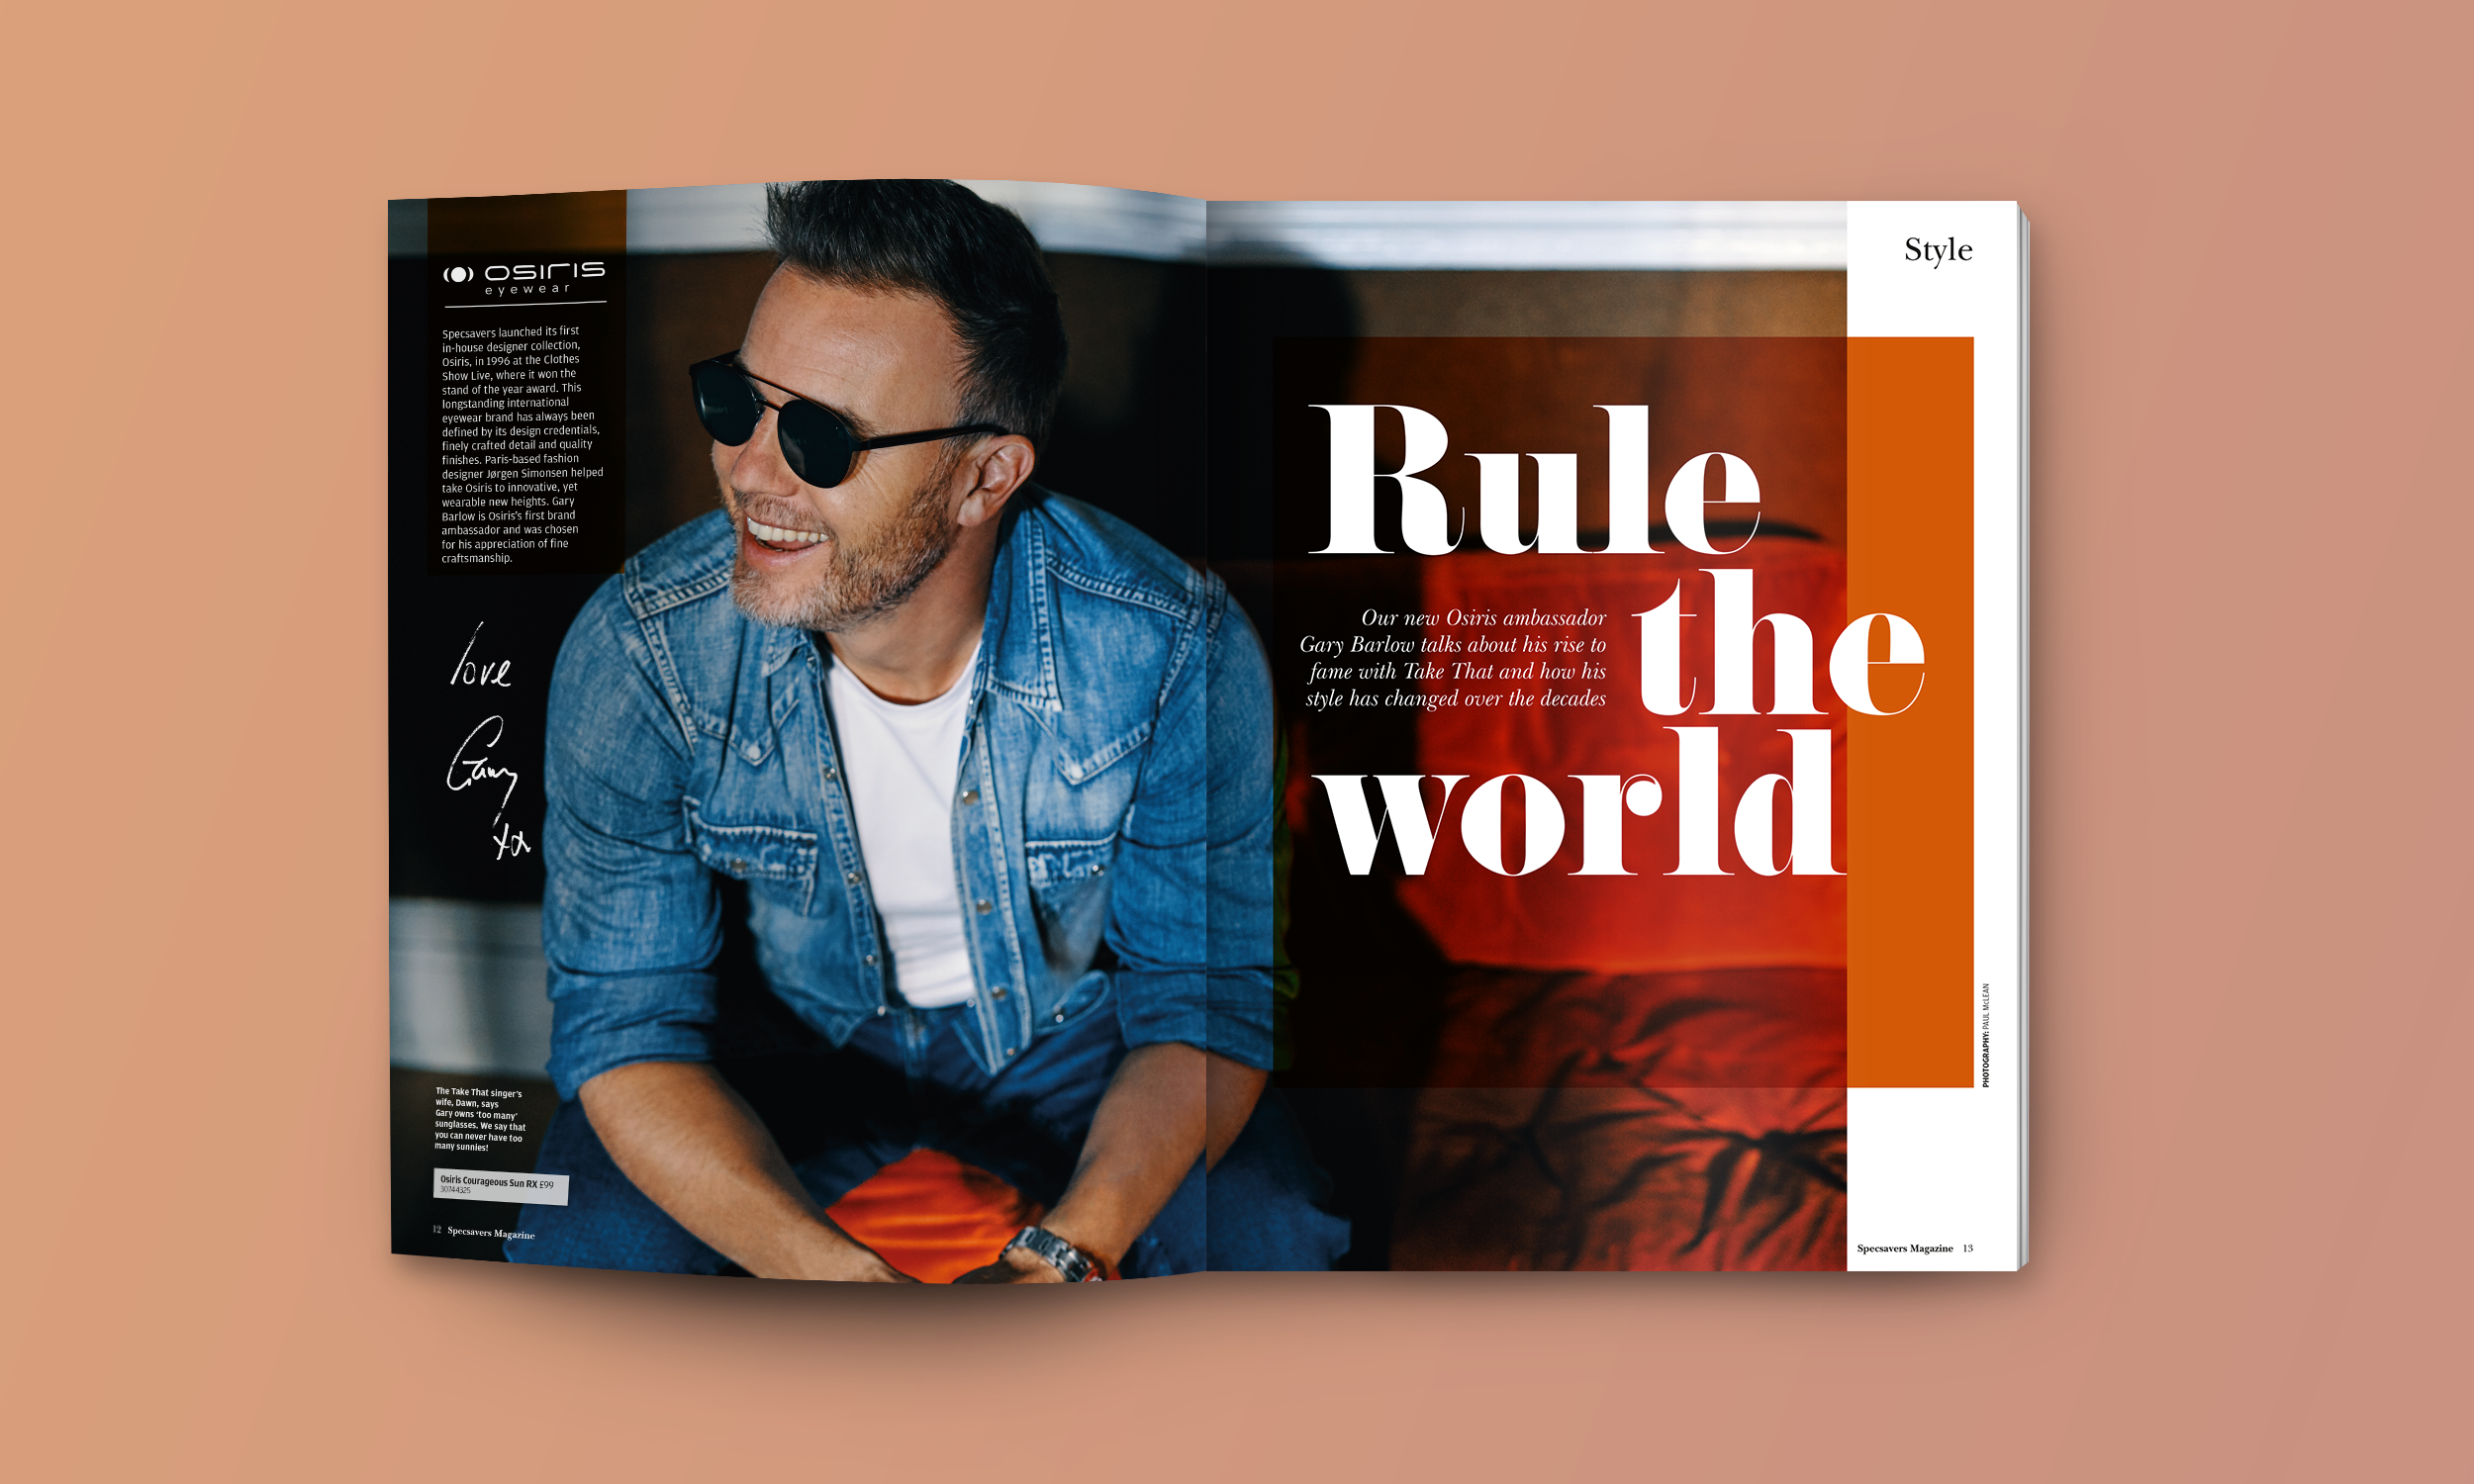 Specsavers Magazine - Gary Barlow Feature